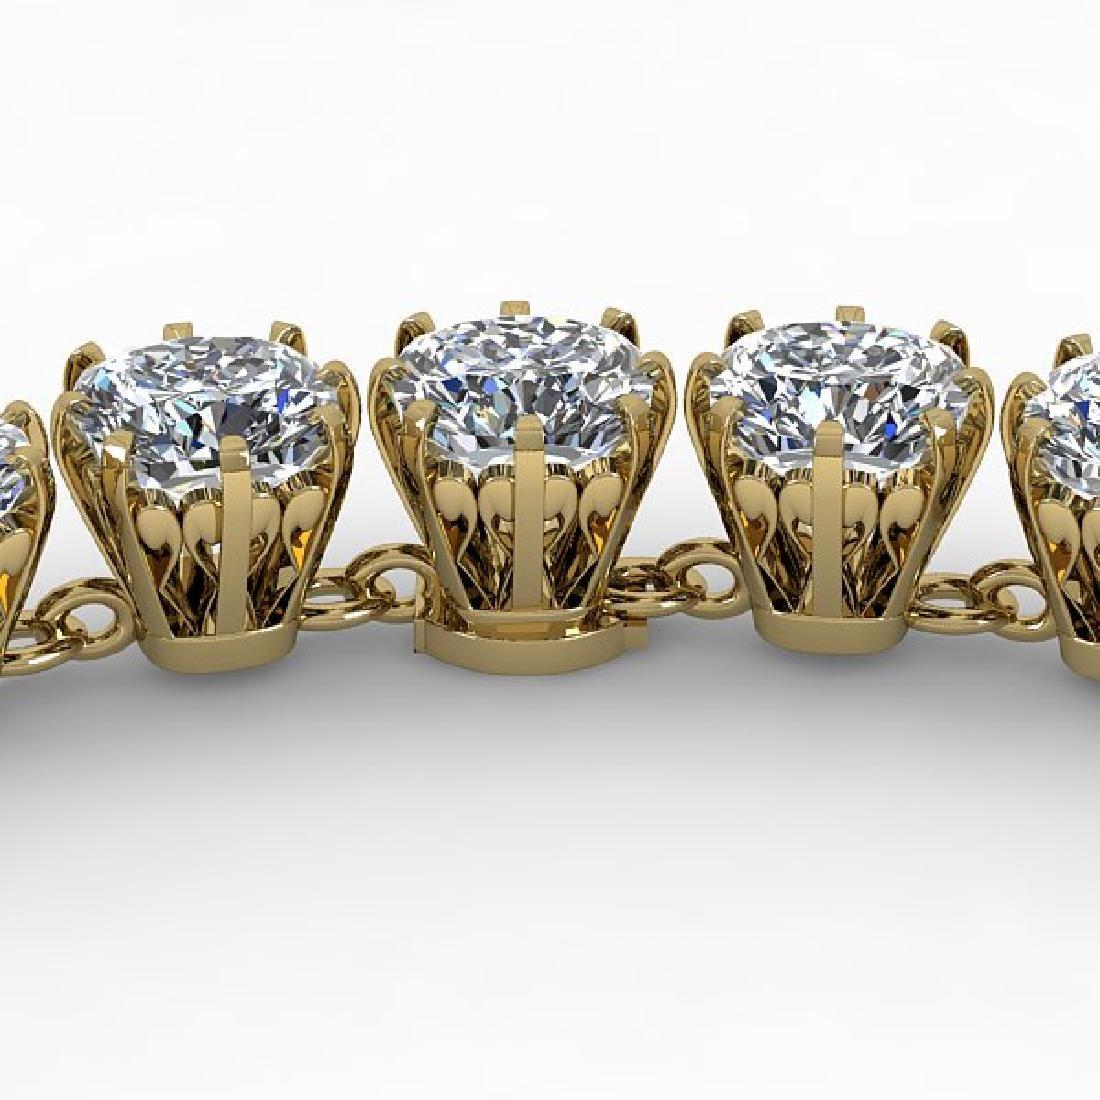 28 CTW Oval Cut SI Certified Diamond Necklace 18K